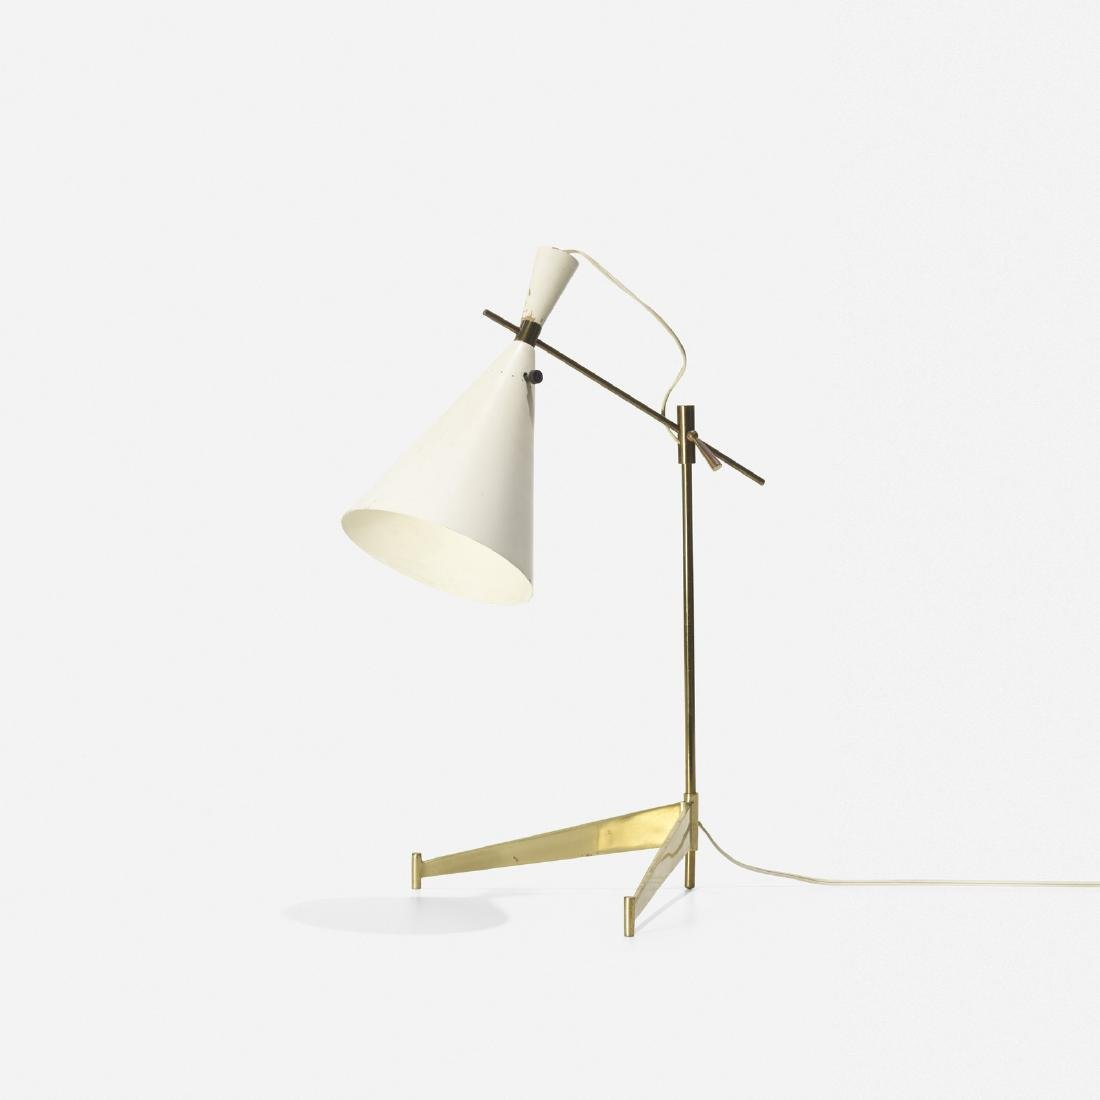 Paul McCobb, E7 table lamp